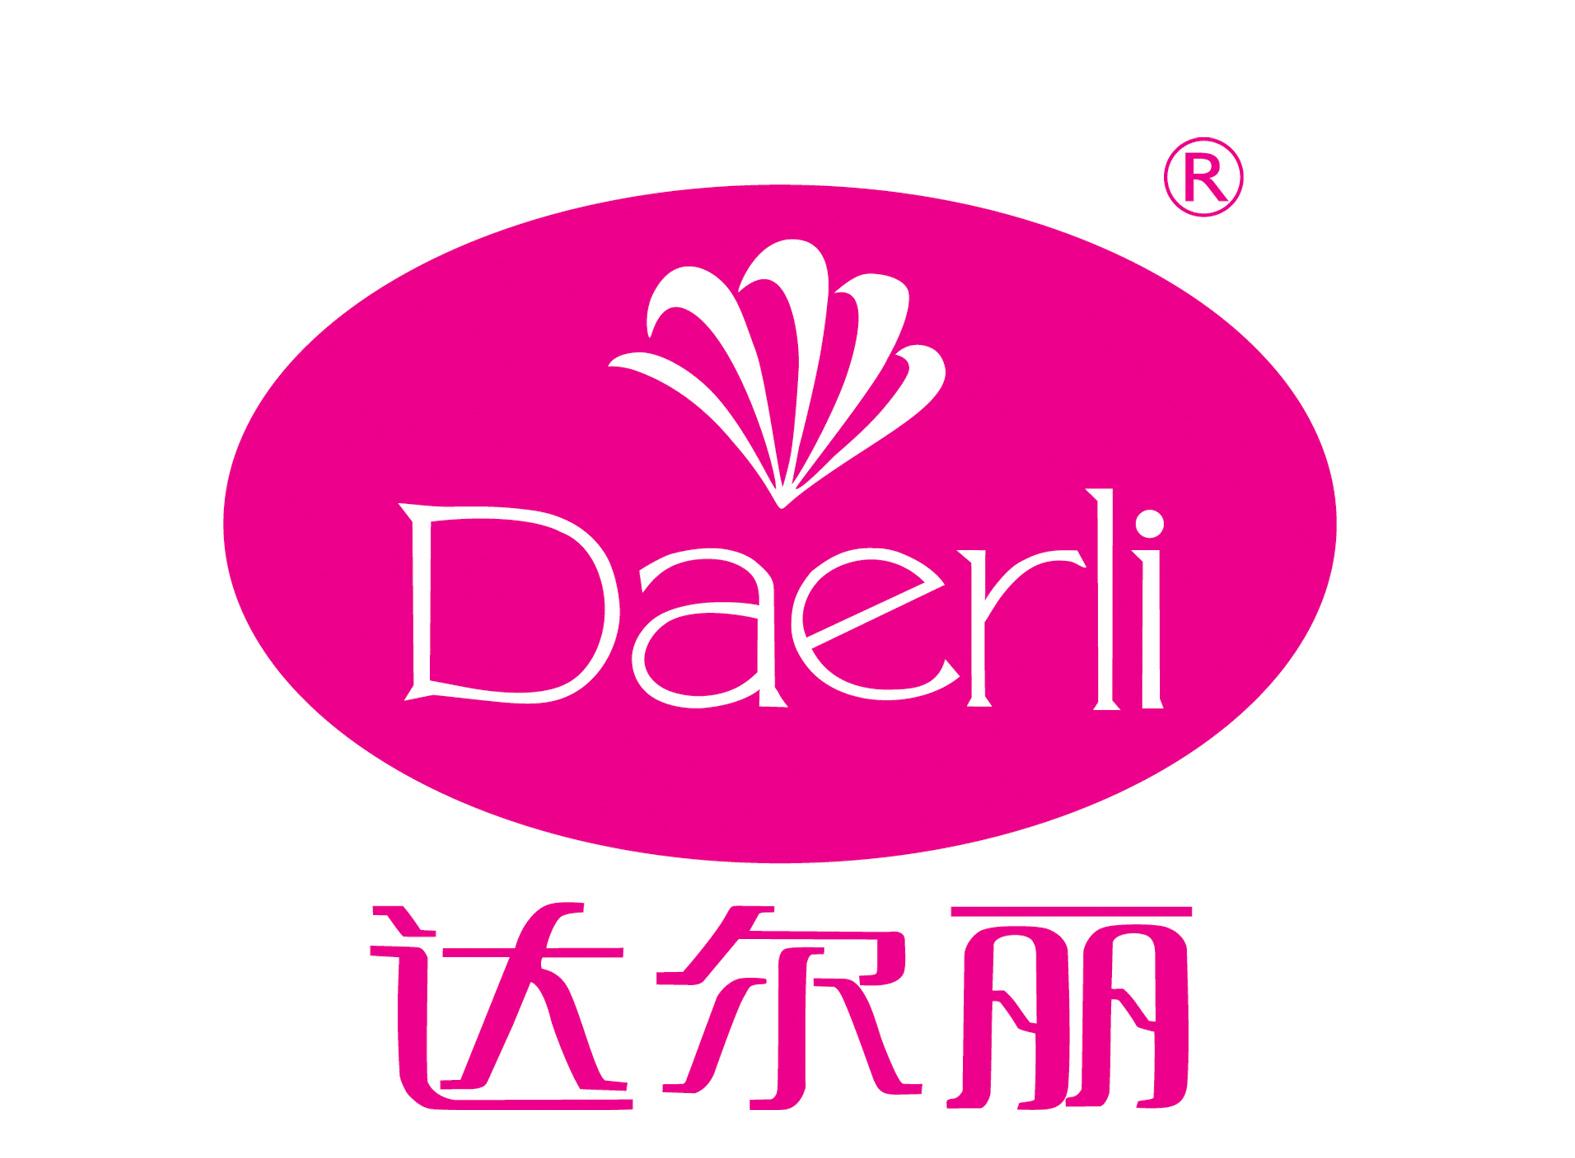 达尔丽(Daerli)